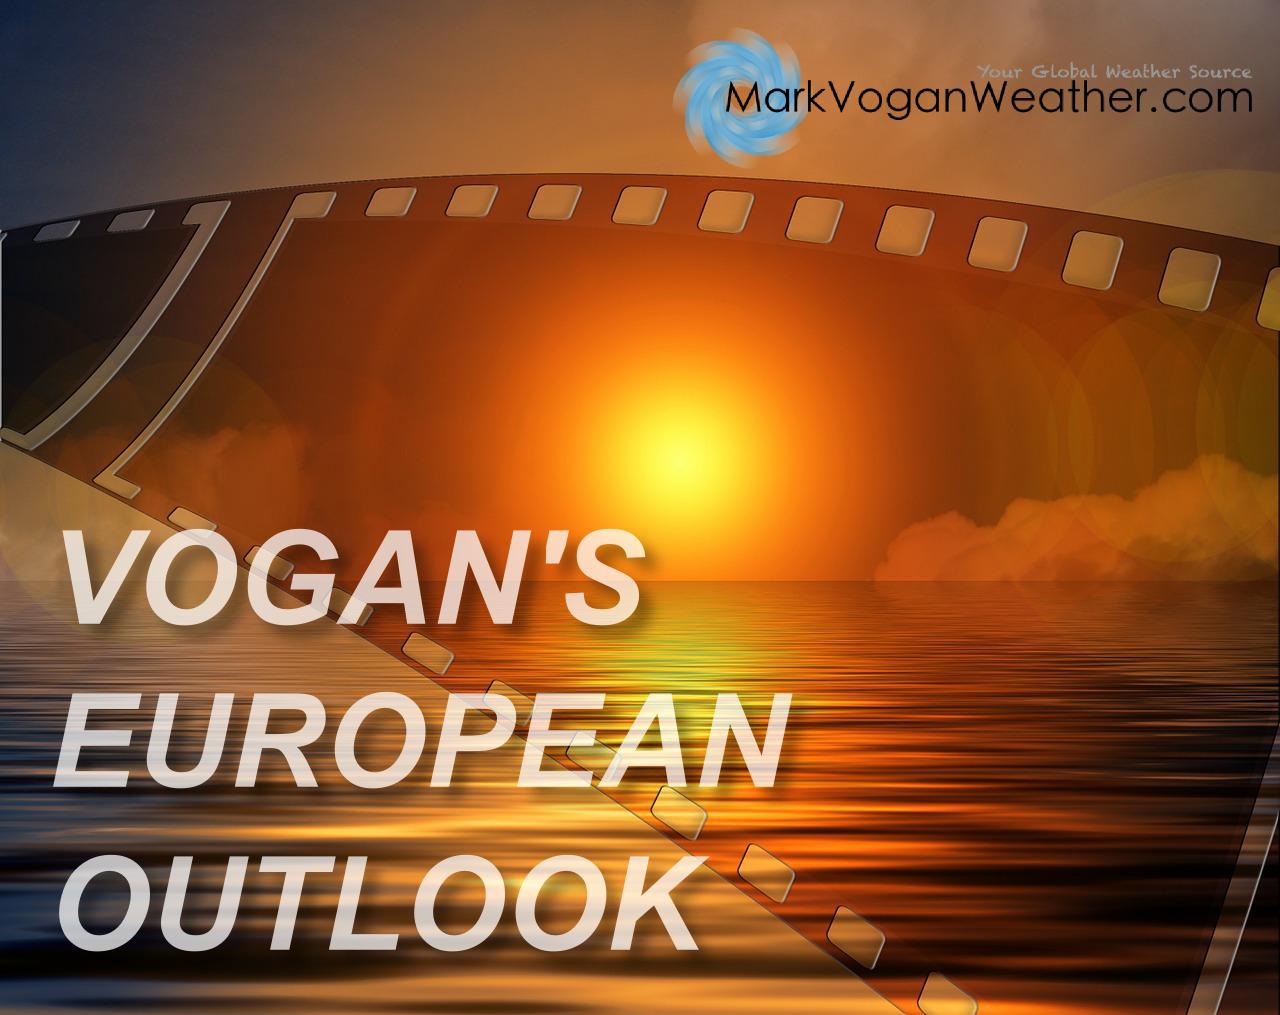 THU 17 JUL: VOGAN'S EUROPEAN OUTLOOK